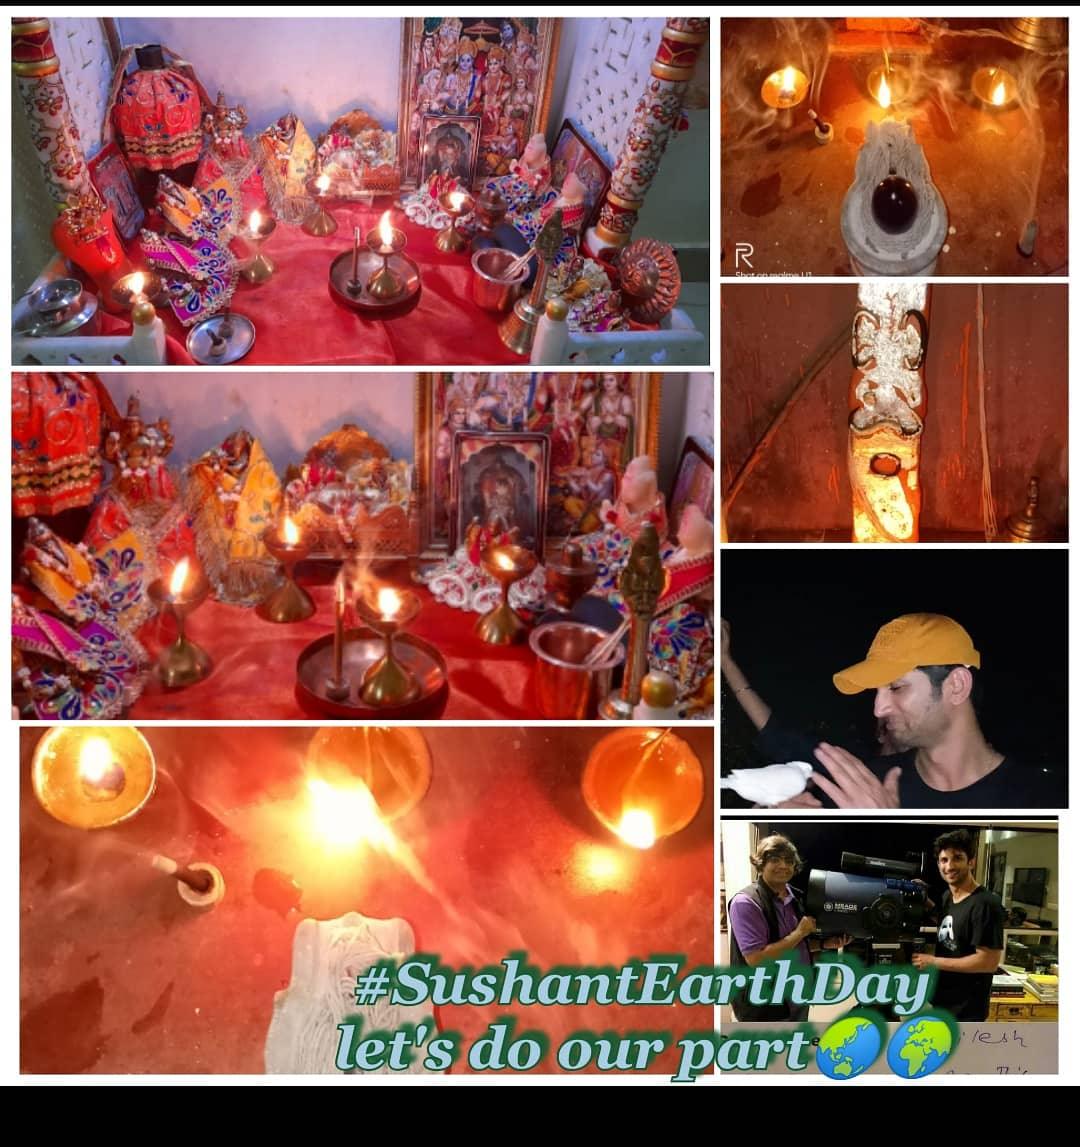 #SushantEarthDay🌍🌎🌏🌍 @nilotpalm3  @shwetasinghkirt  @narendramodi  @smitaparikh2  @vikirti  @_mallika_singh  After worship to God. 🔱🔱🙏🙏 https://t.co/HtMvHSIdFM